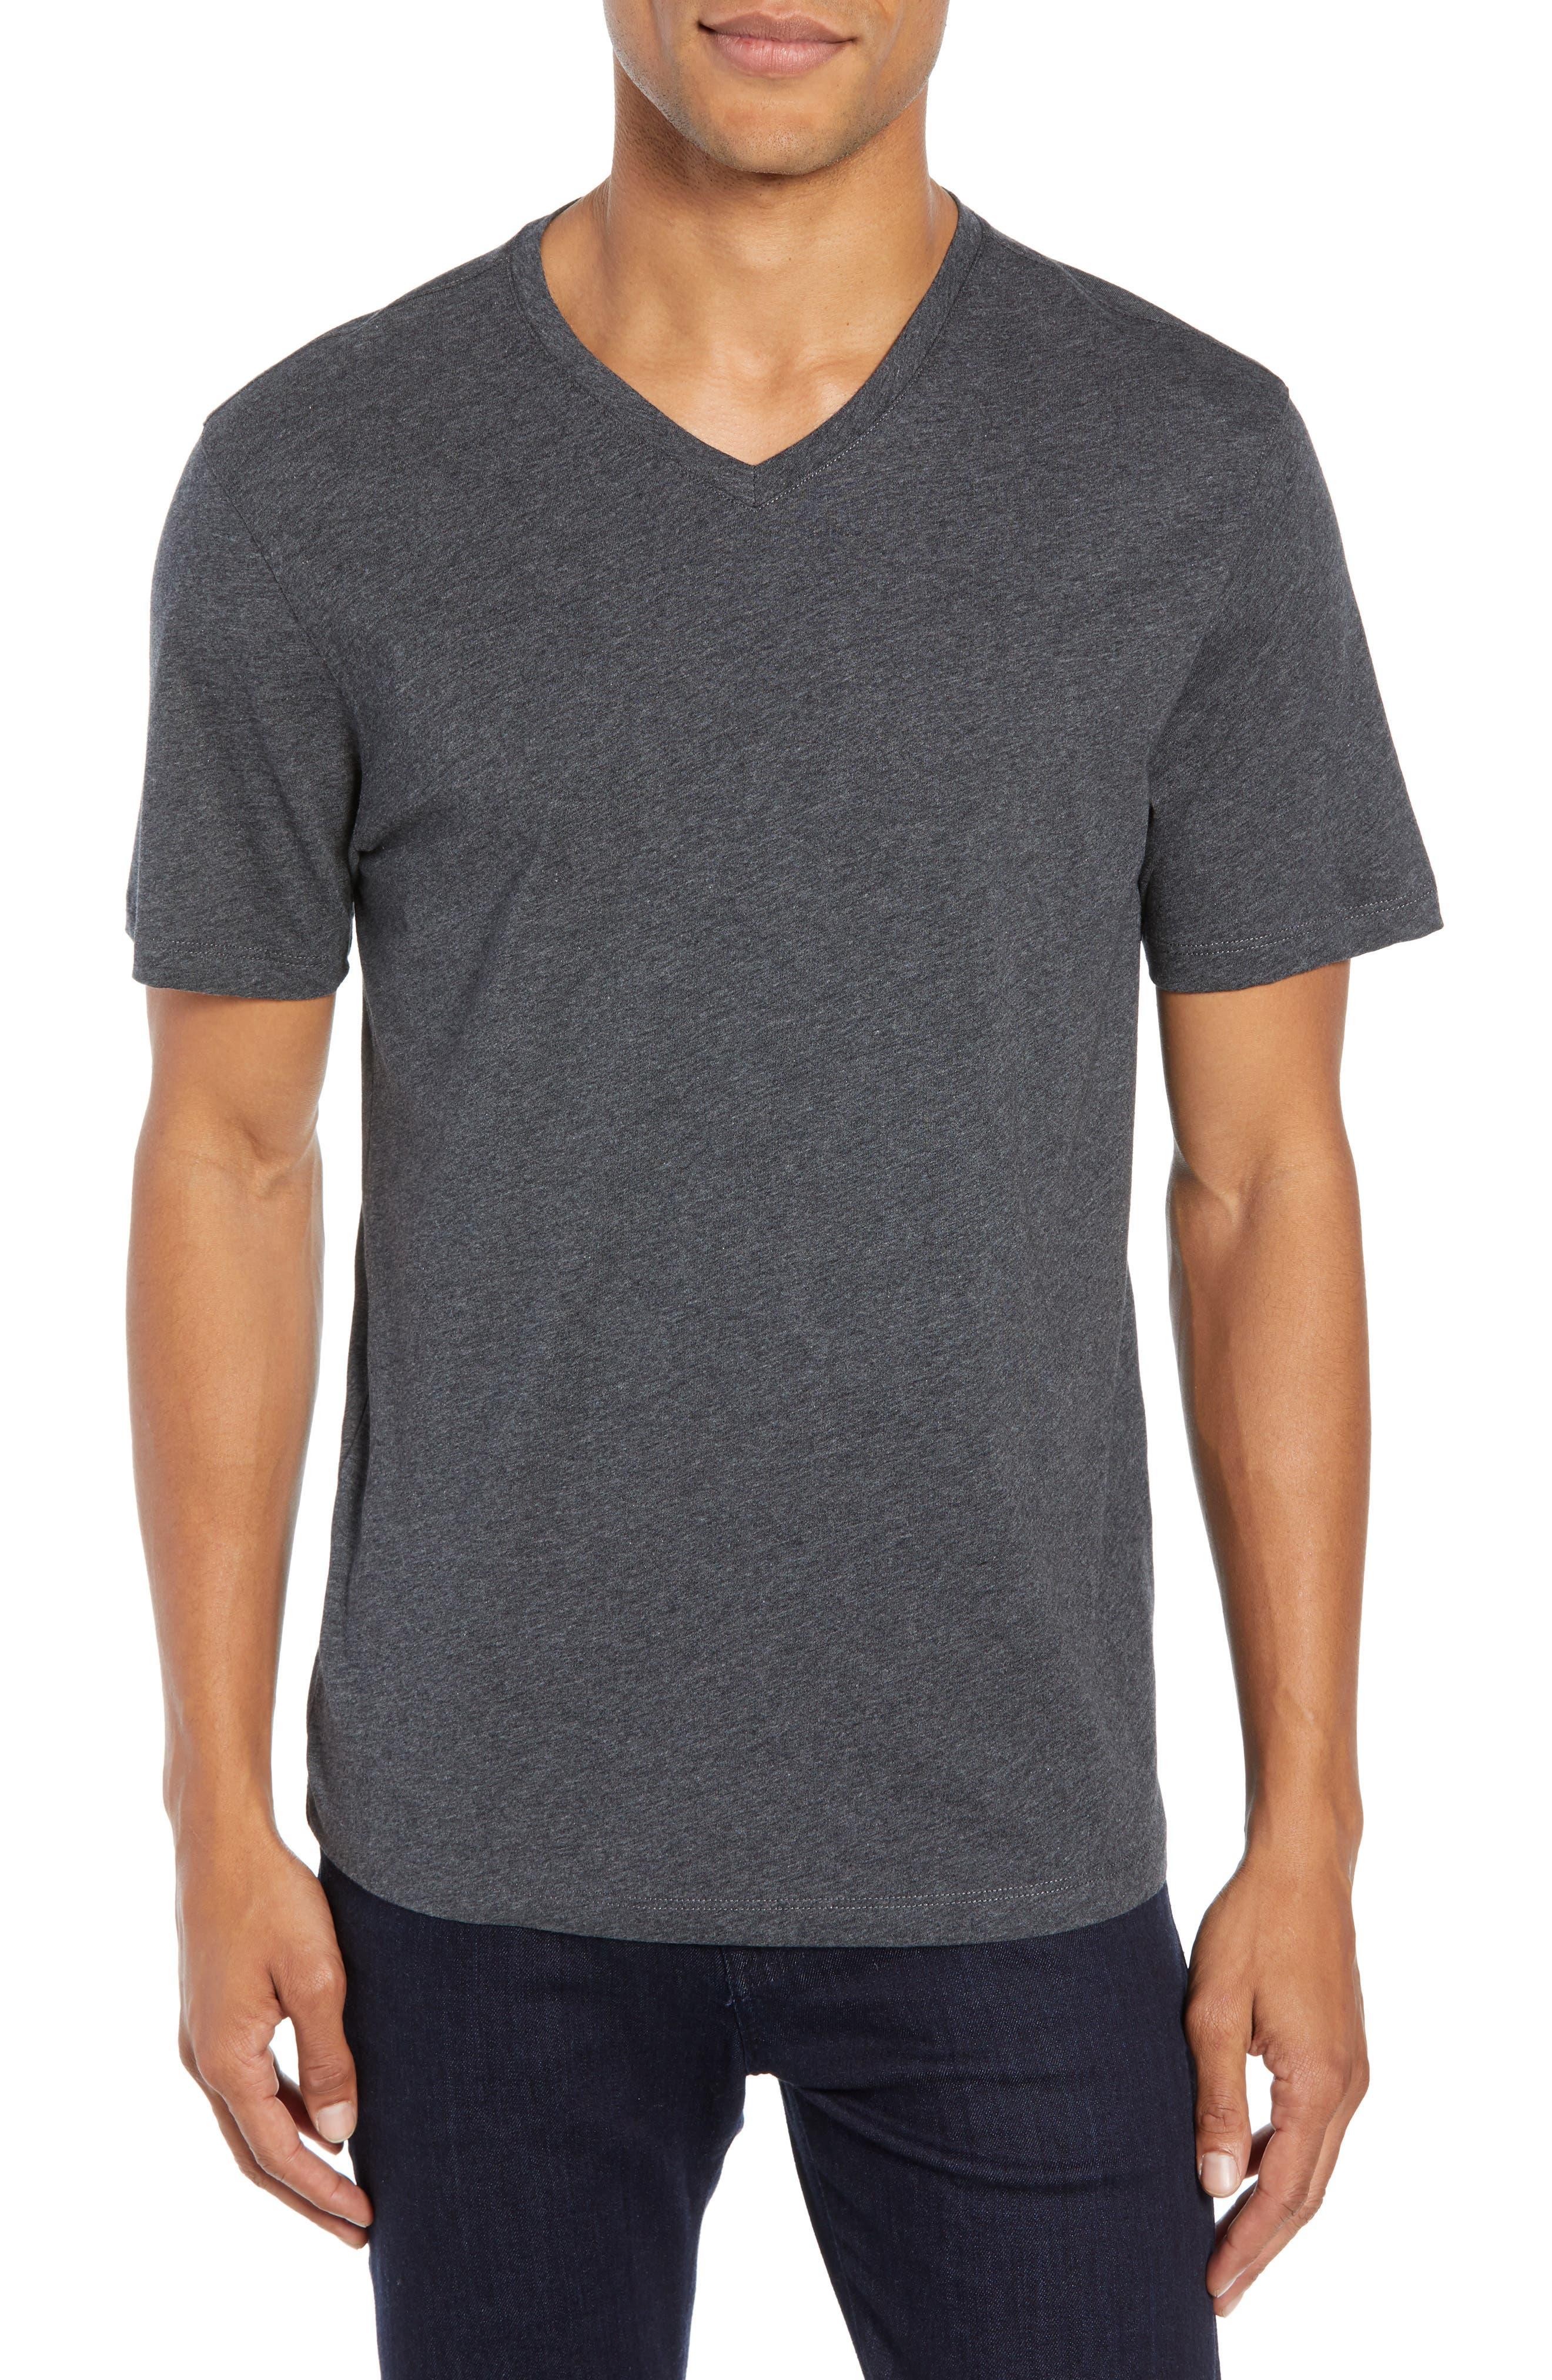 Mercer V-Neck T-Shirt,                         Main,                         color, DARK HEATHER CHARCOAL